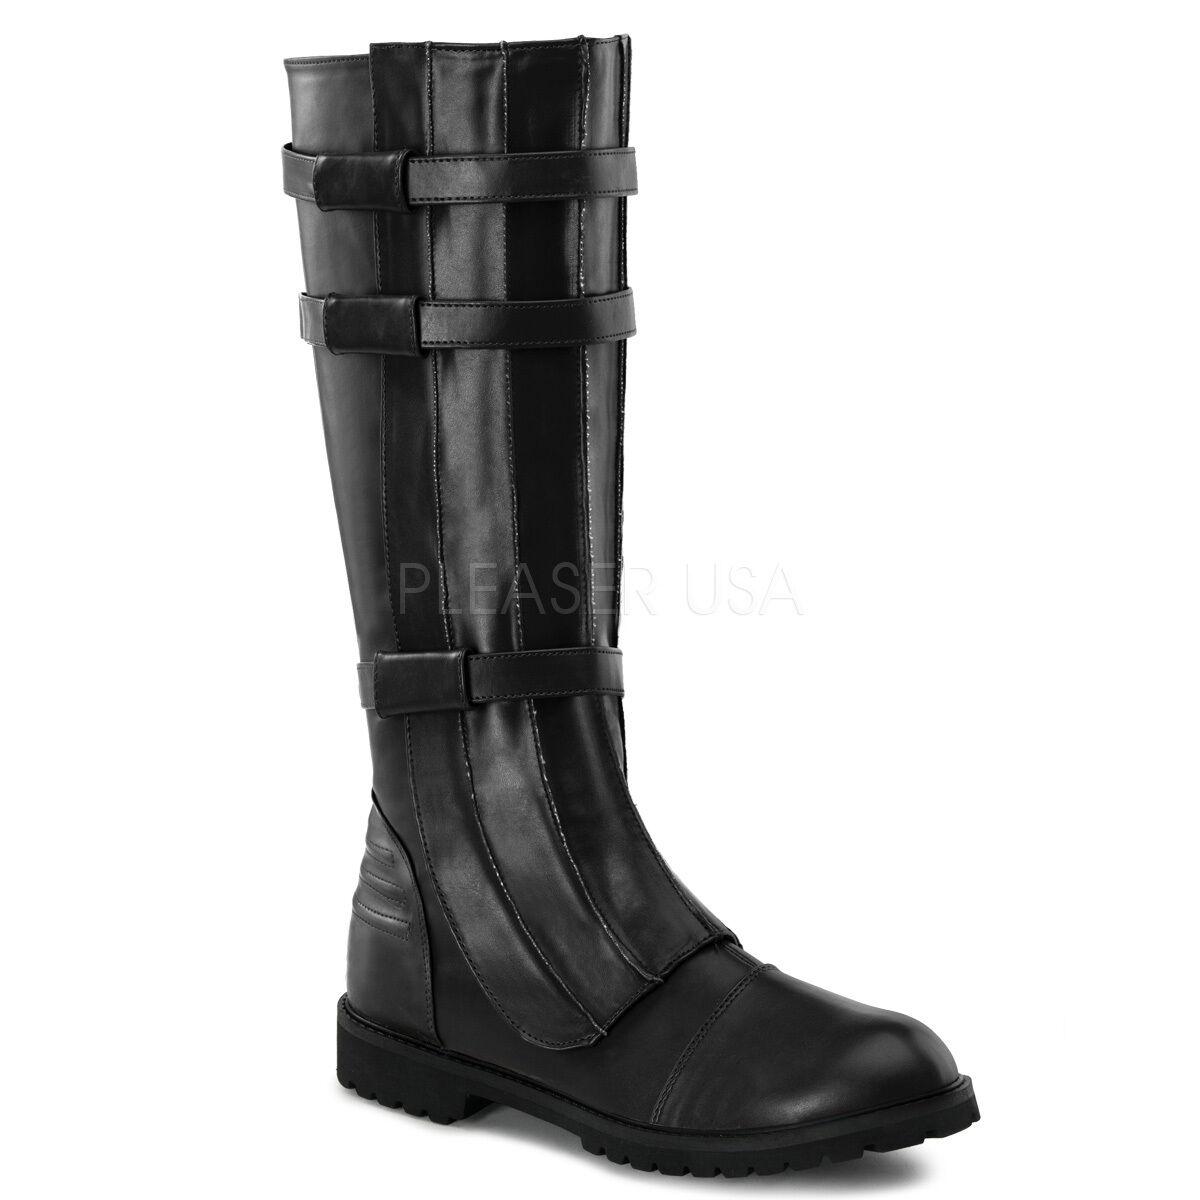 WAL130 B PU Men's Combat Military Fantasy Cosplay Black Halloween Costume Boots